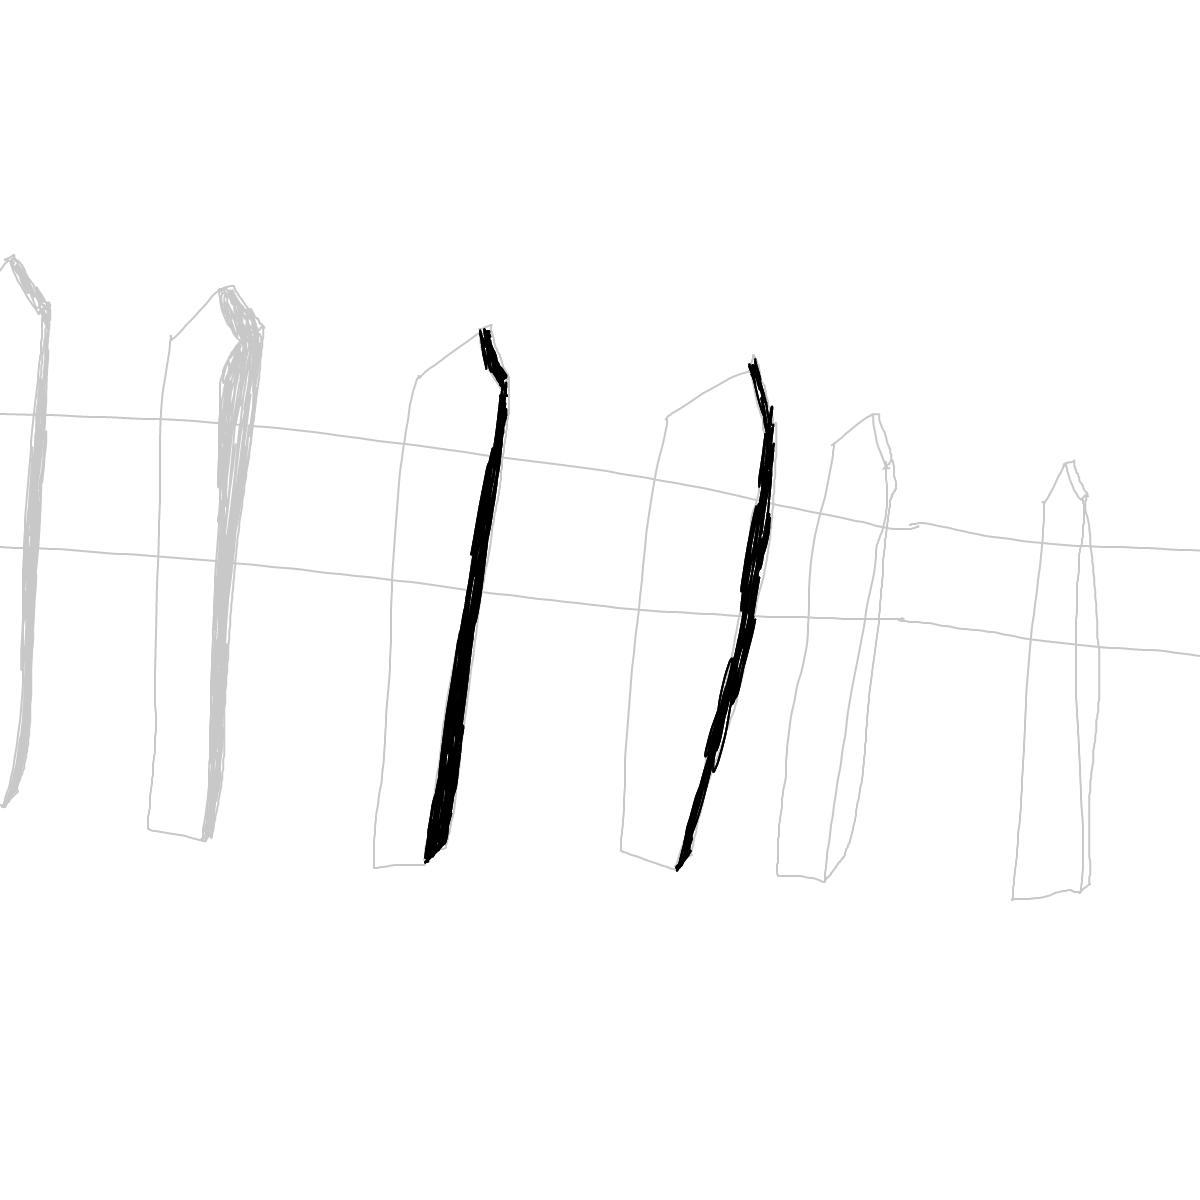 BAAAM drawing#9374 lat:52.4750556945800800lng: 13.4071340560913090